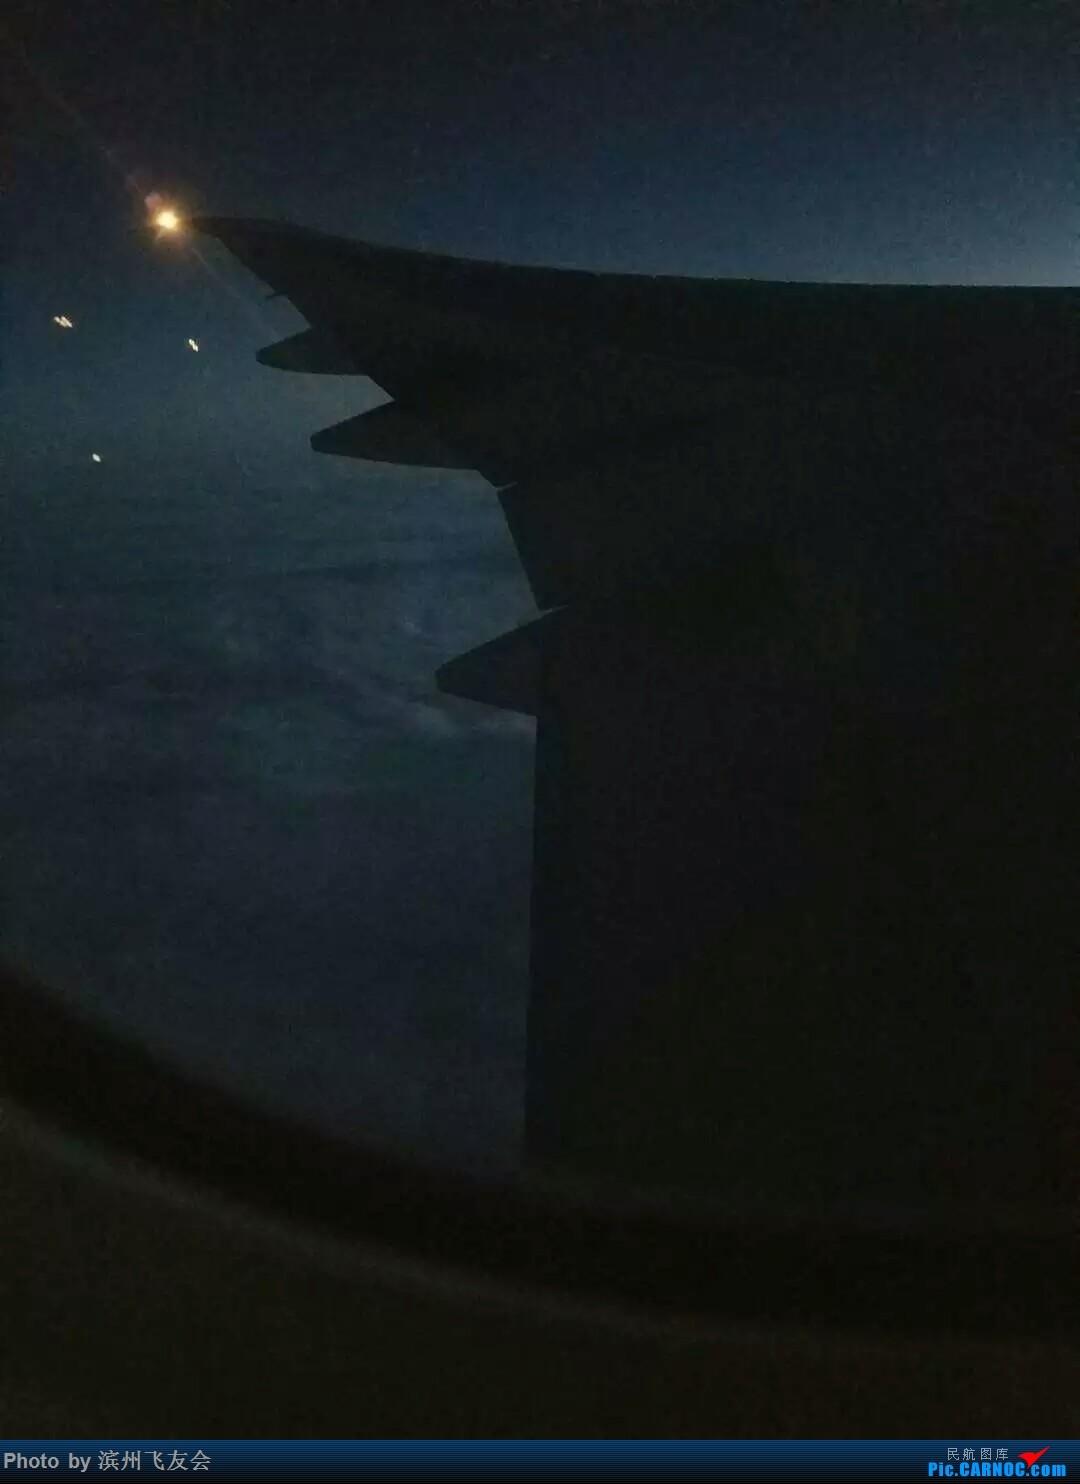 Re:[原创]全日空美国游记2-东京羽田,洛杉矶 BOEING 777-200ER